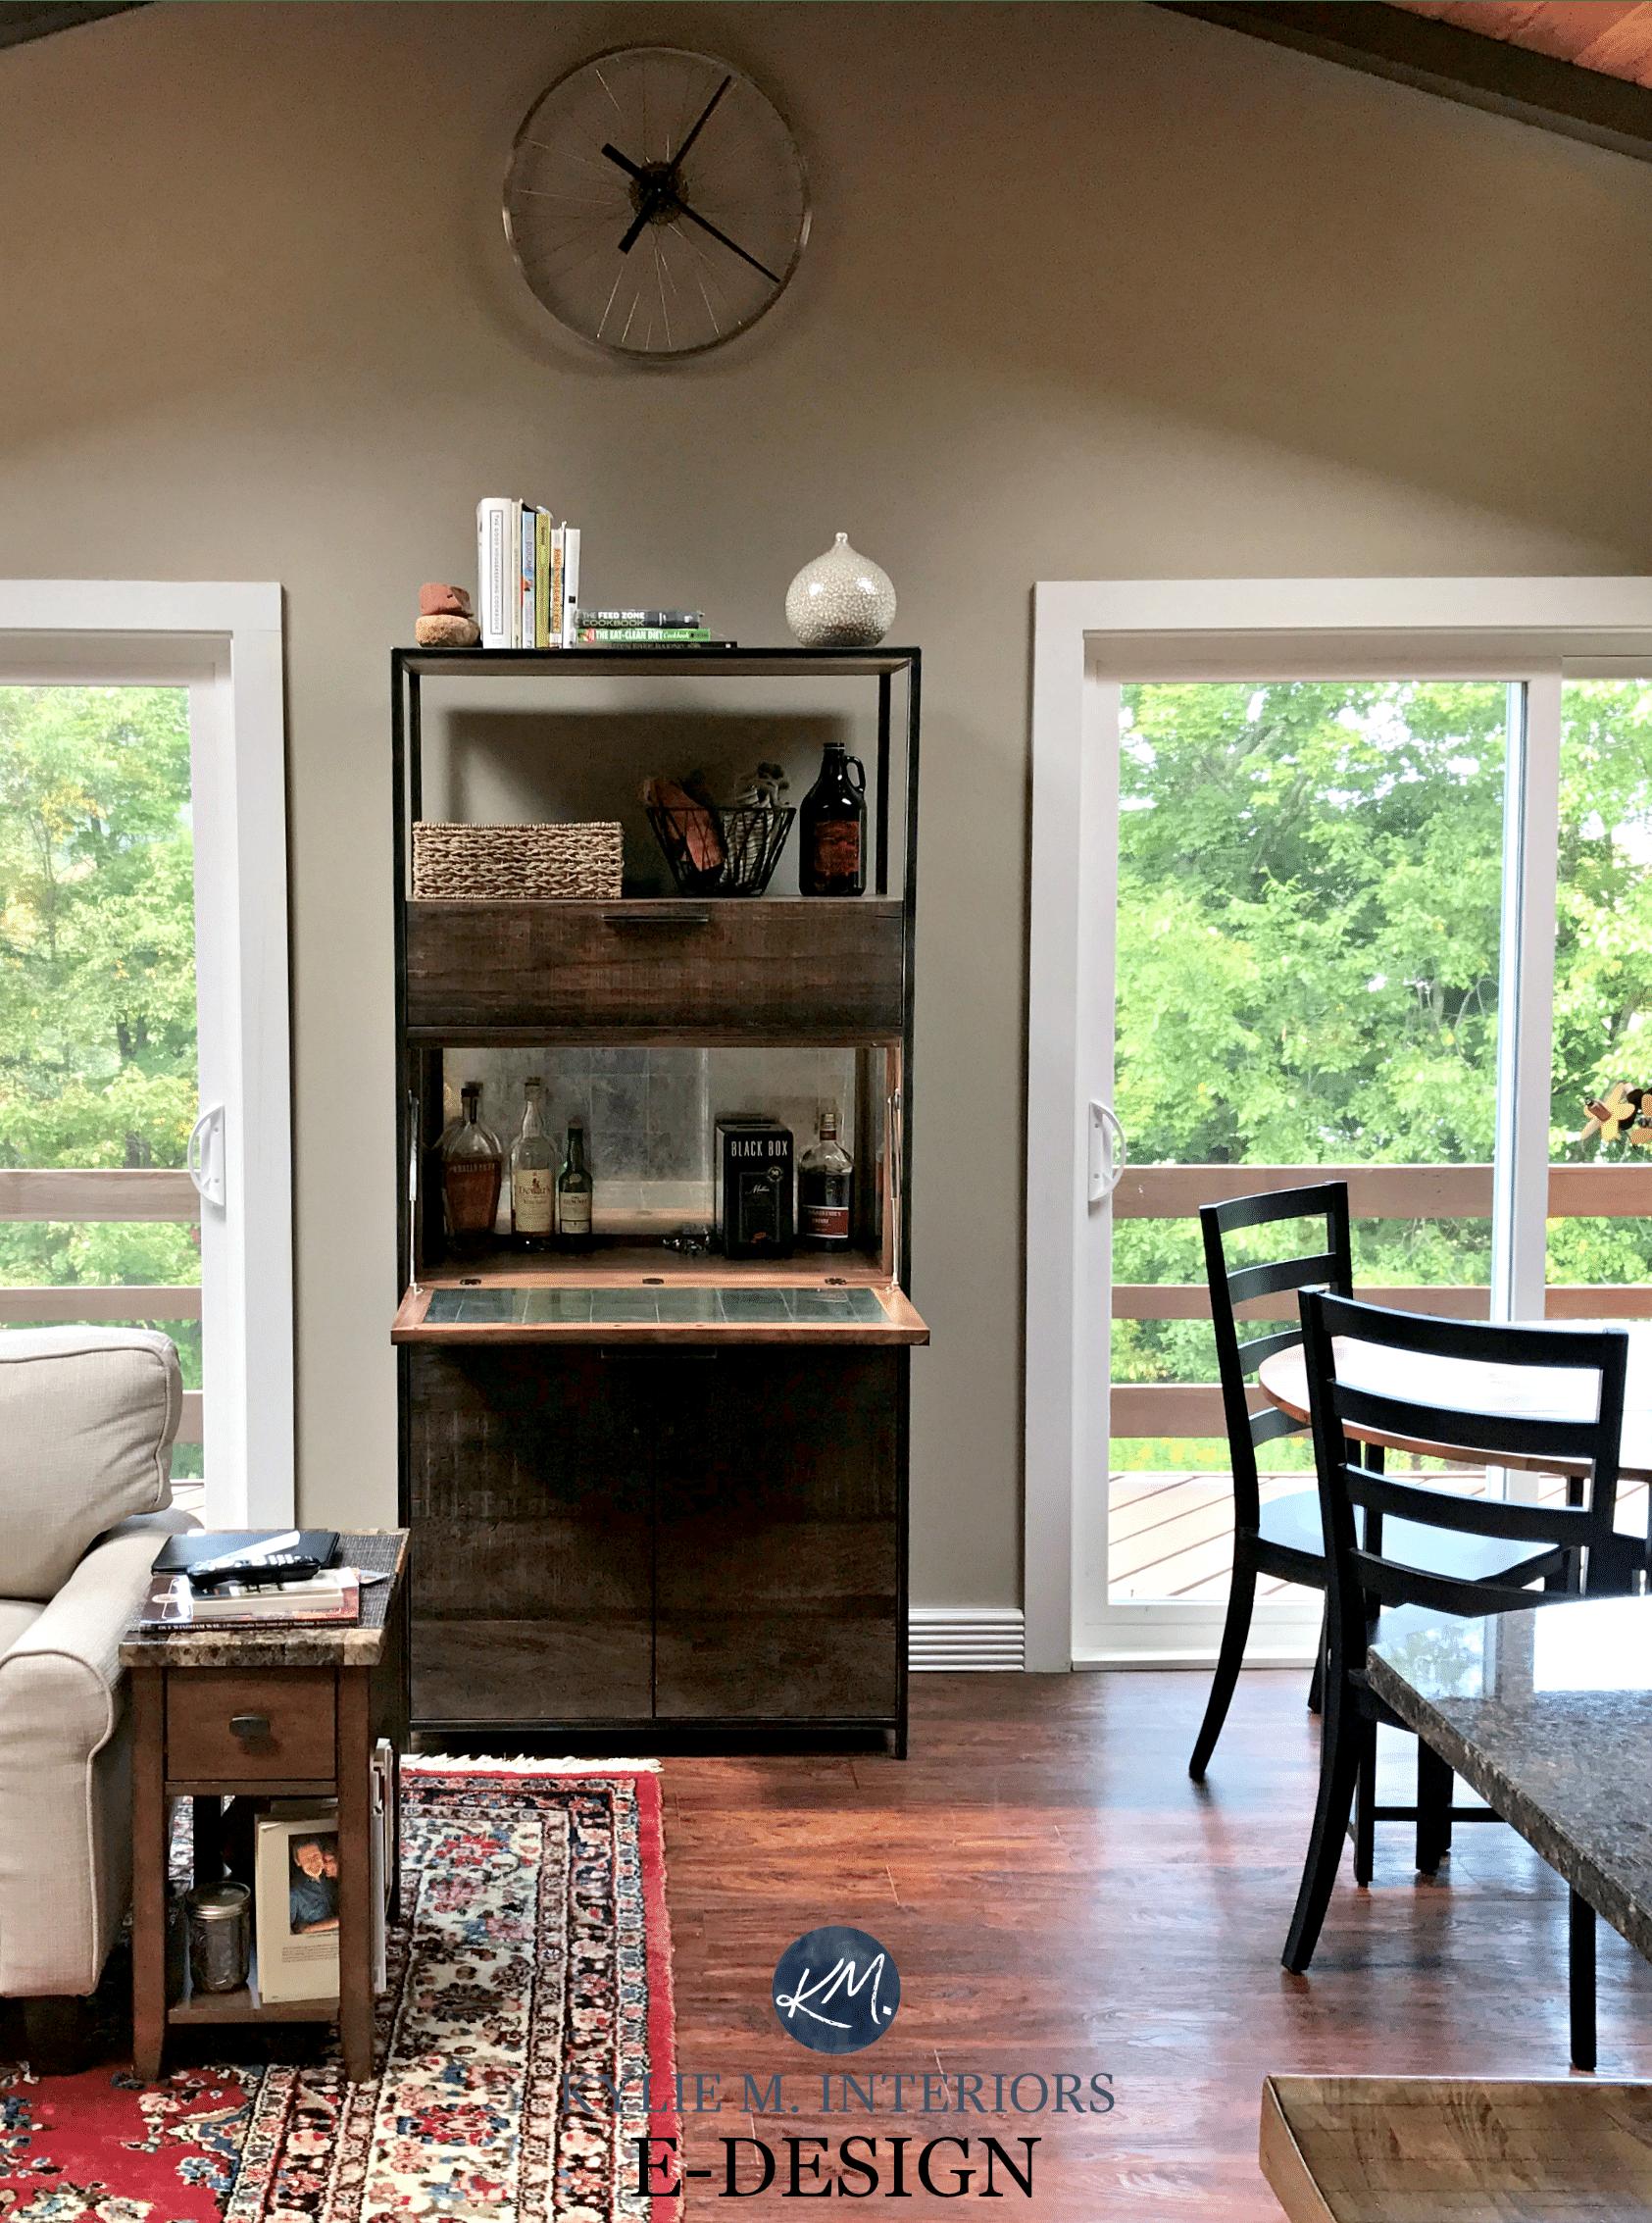 Benjamin Moore Pashmina, Best Mushroom Greige Paint Colour. Vaulted  Ceiling, Wood Furniture. KYlie M E Design